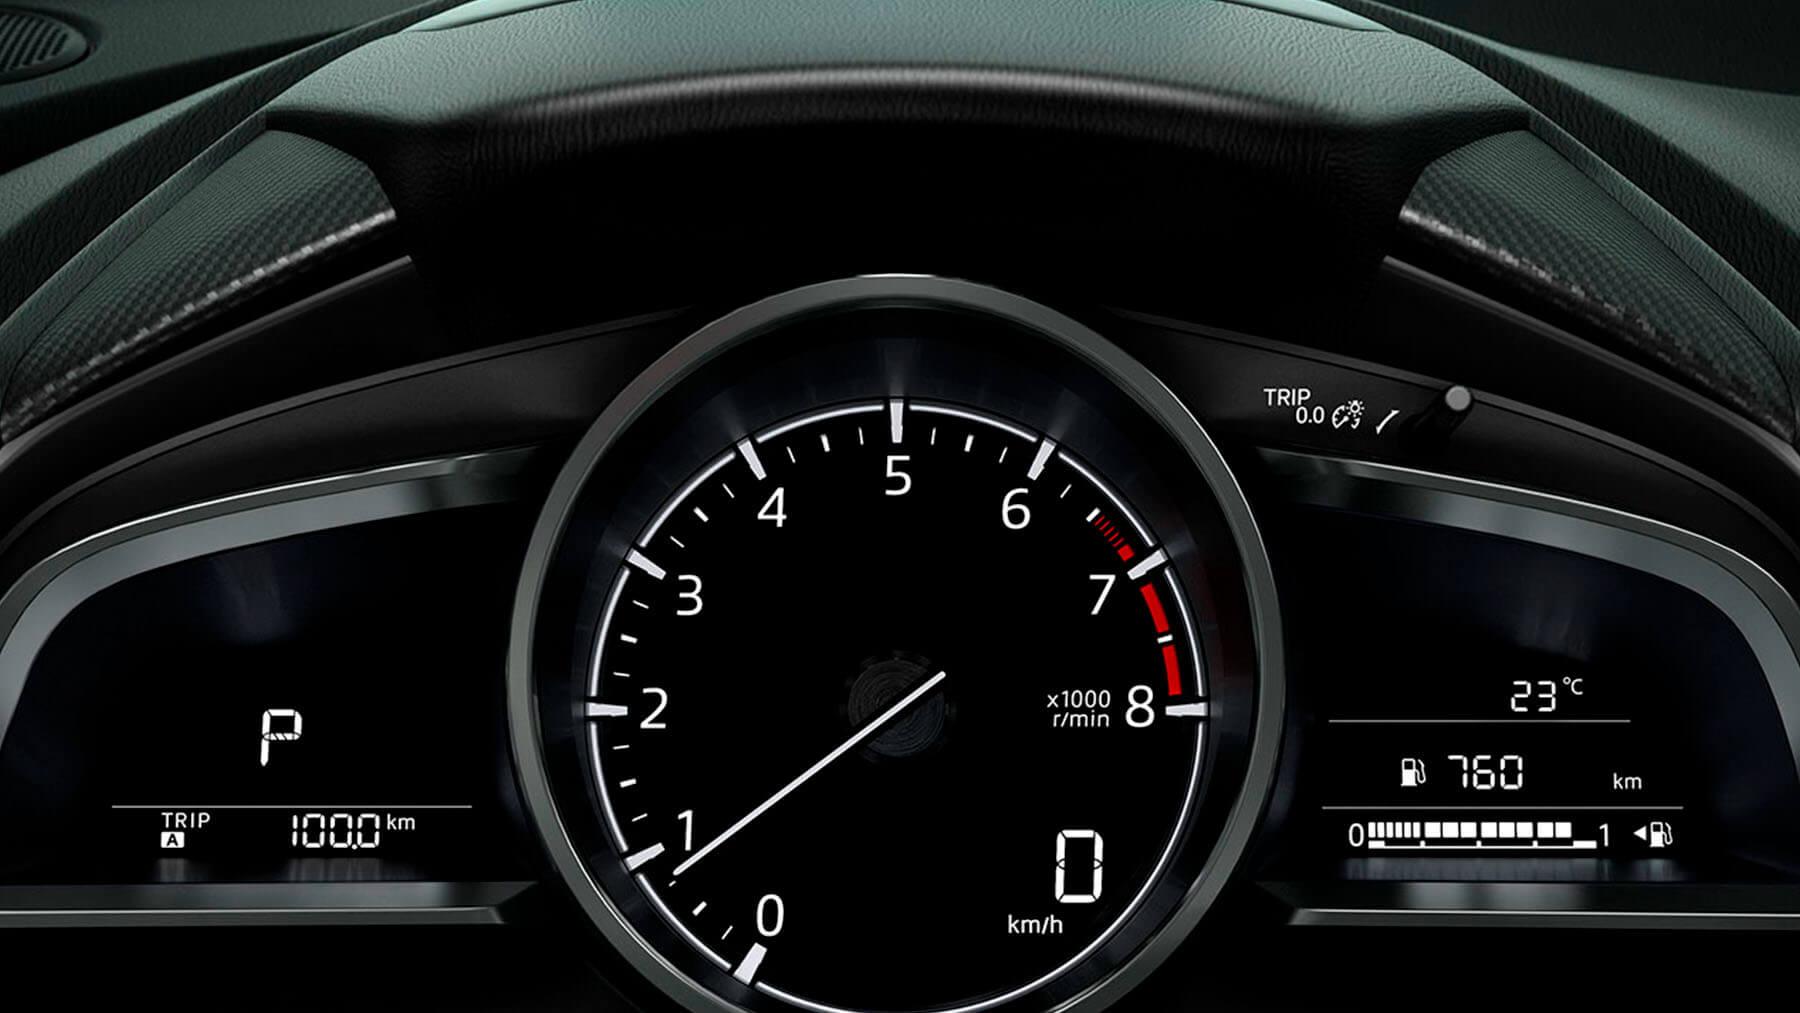 Galeria - Mazda 2 Sedán